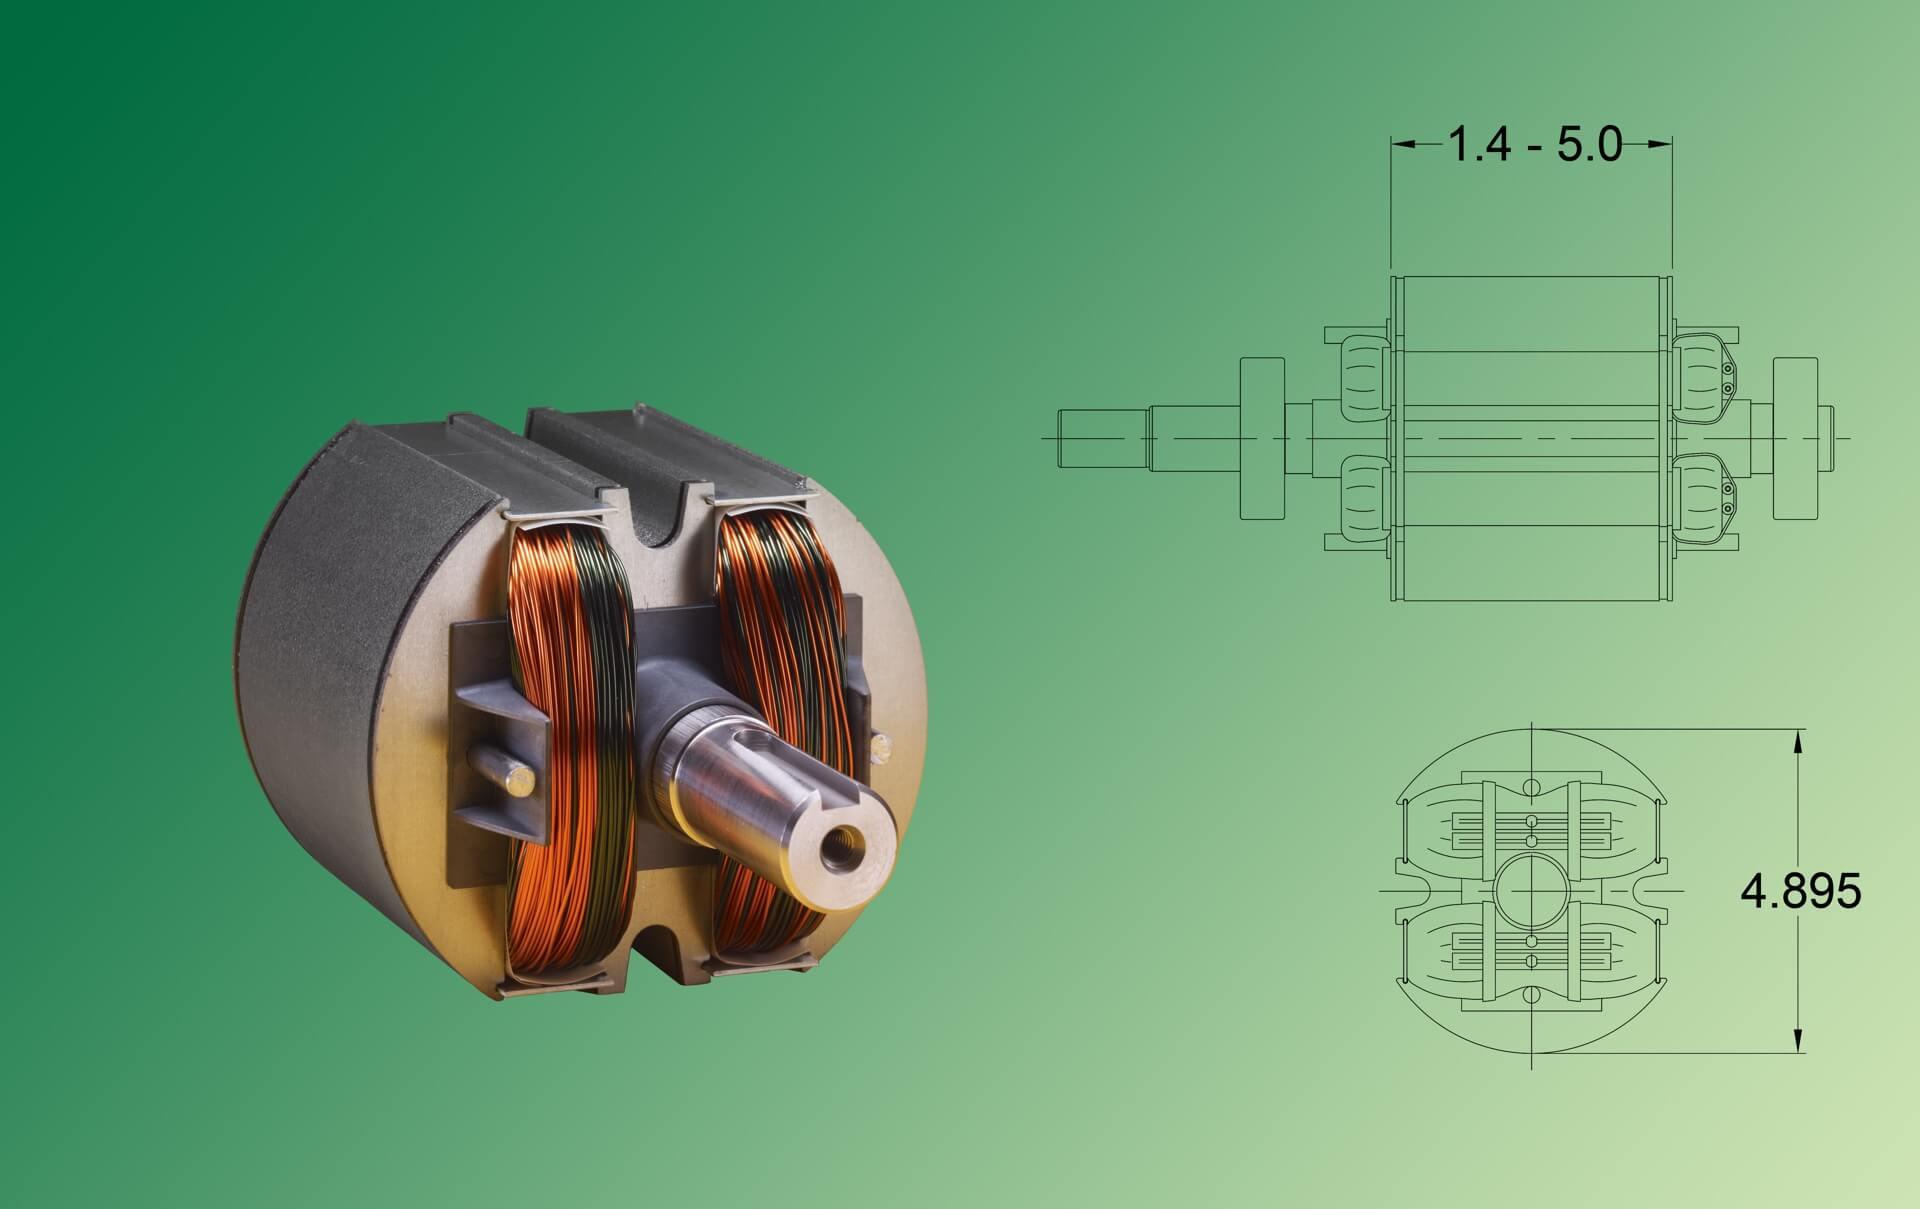 Generator Heads  U0026 Generator Motors For Commercial Power Generators